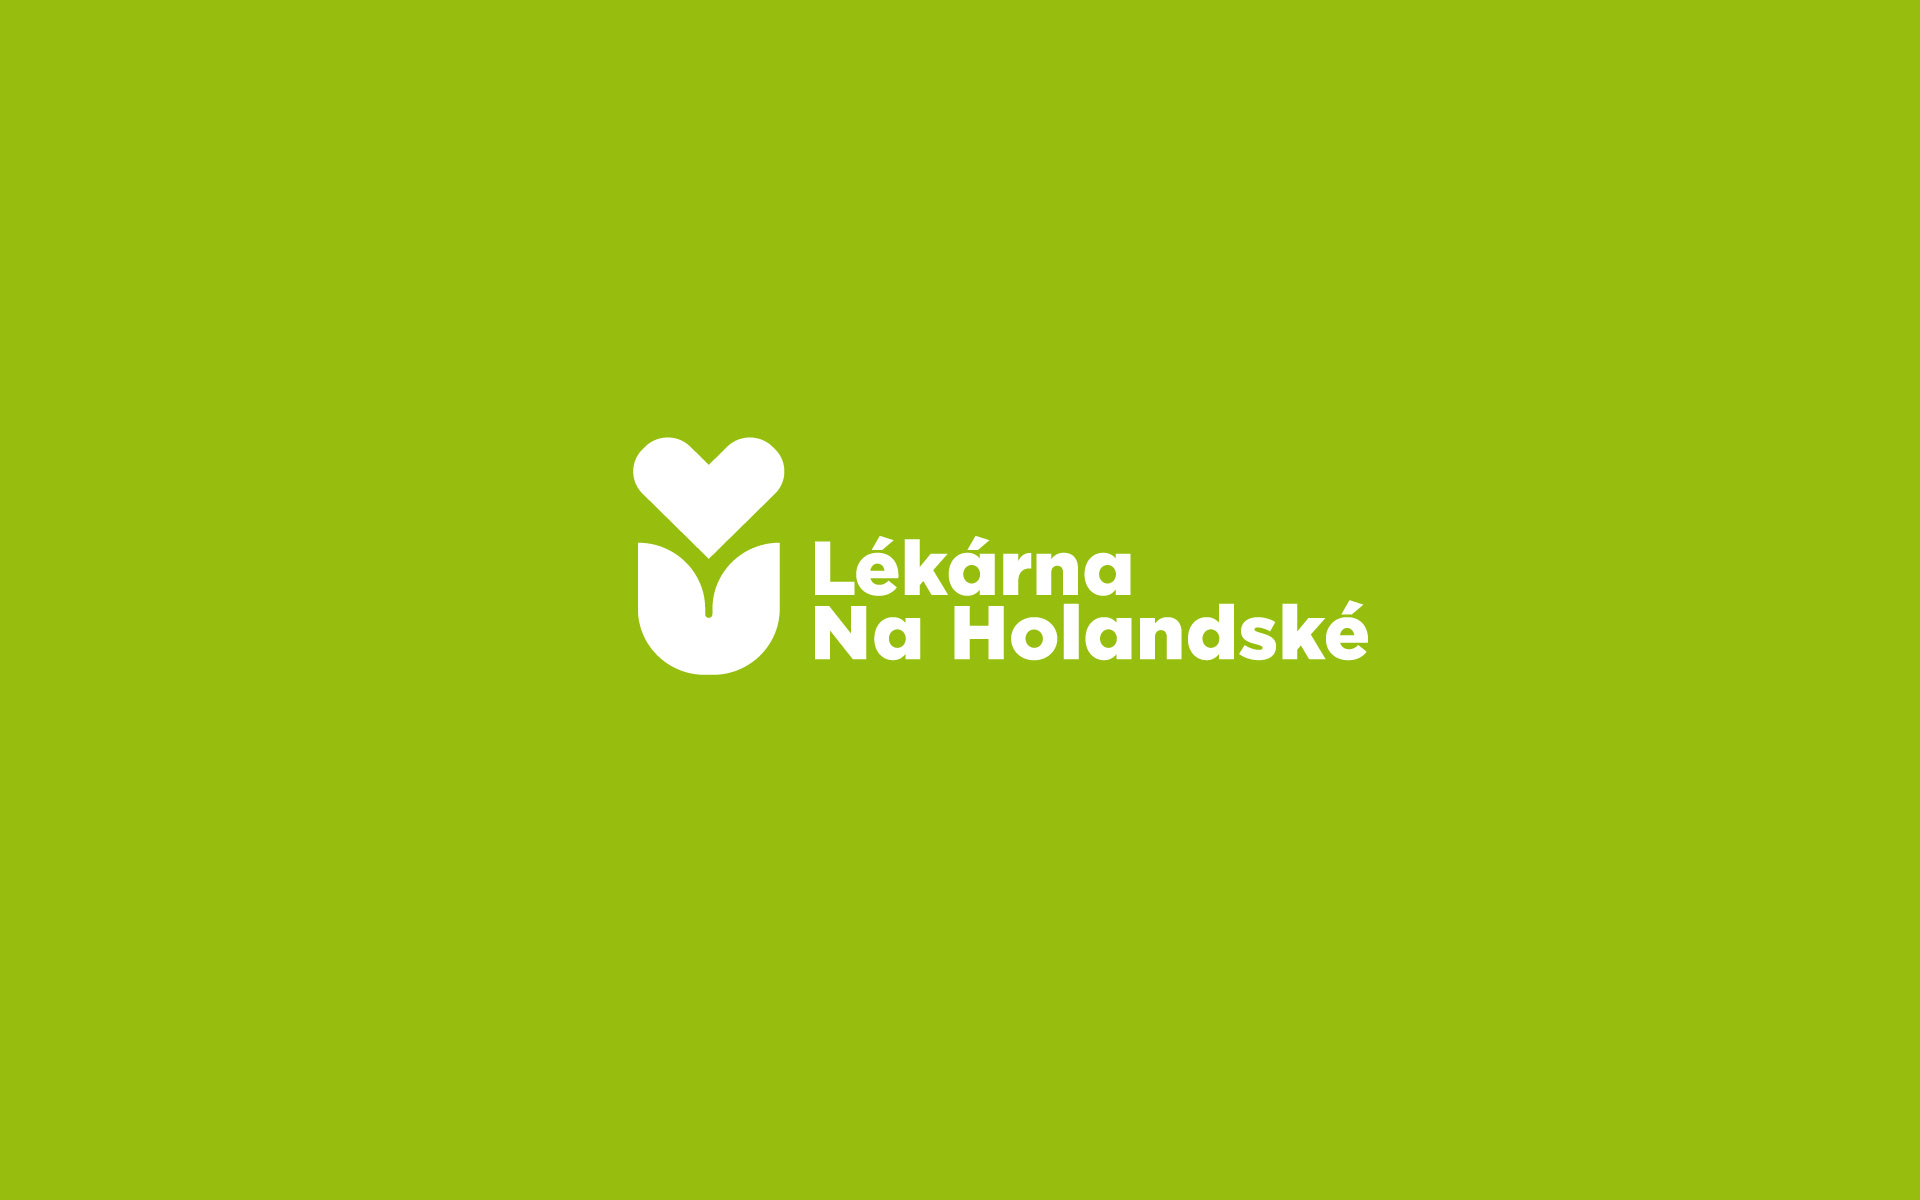 littlebrand-logo-lekarna-na-holandske-2